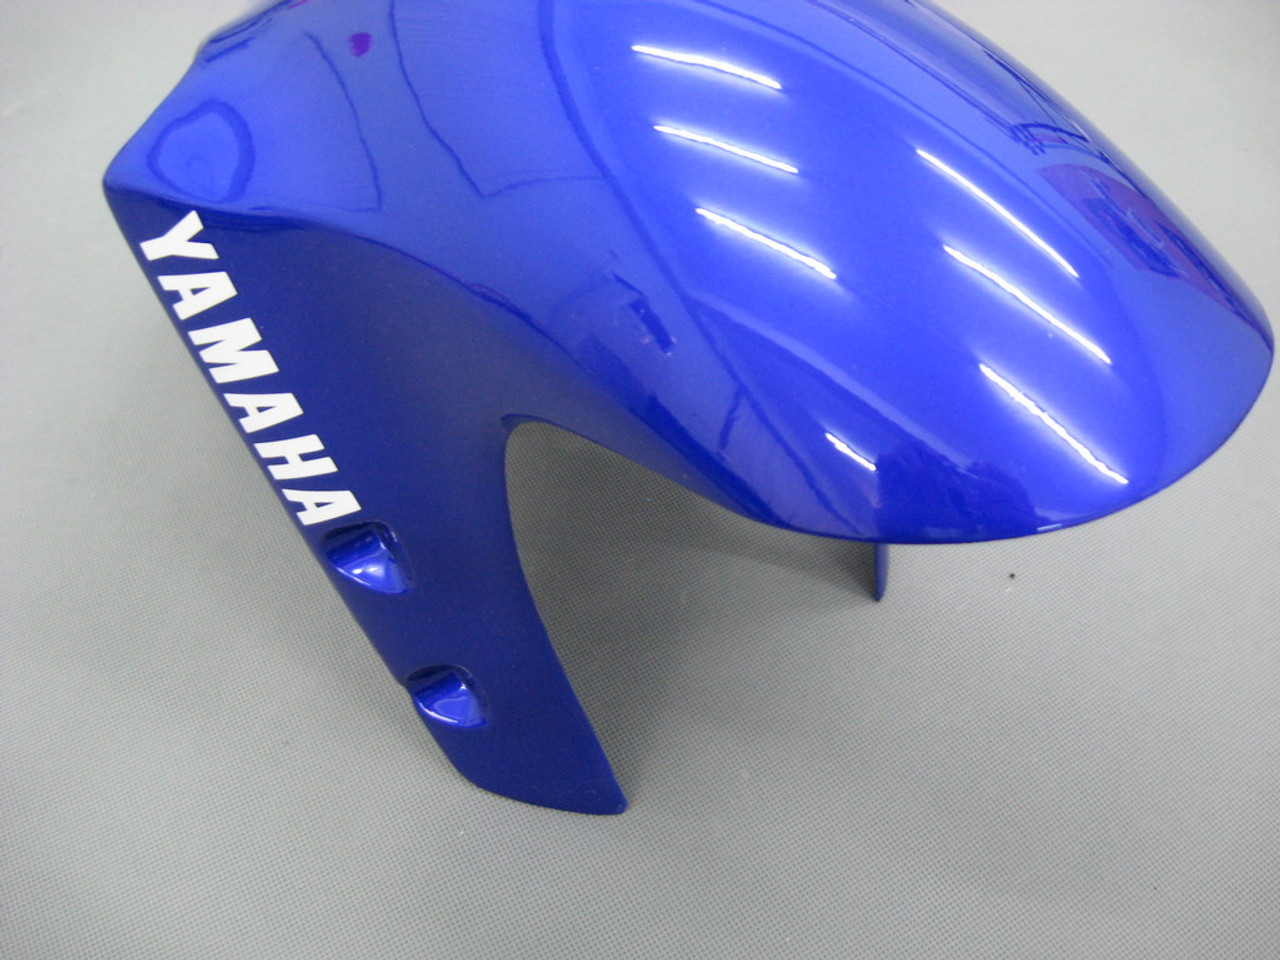 Fairings Yamaha YZF-R1 Blue White R1 Racing (2000-2001)